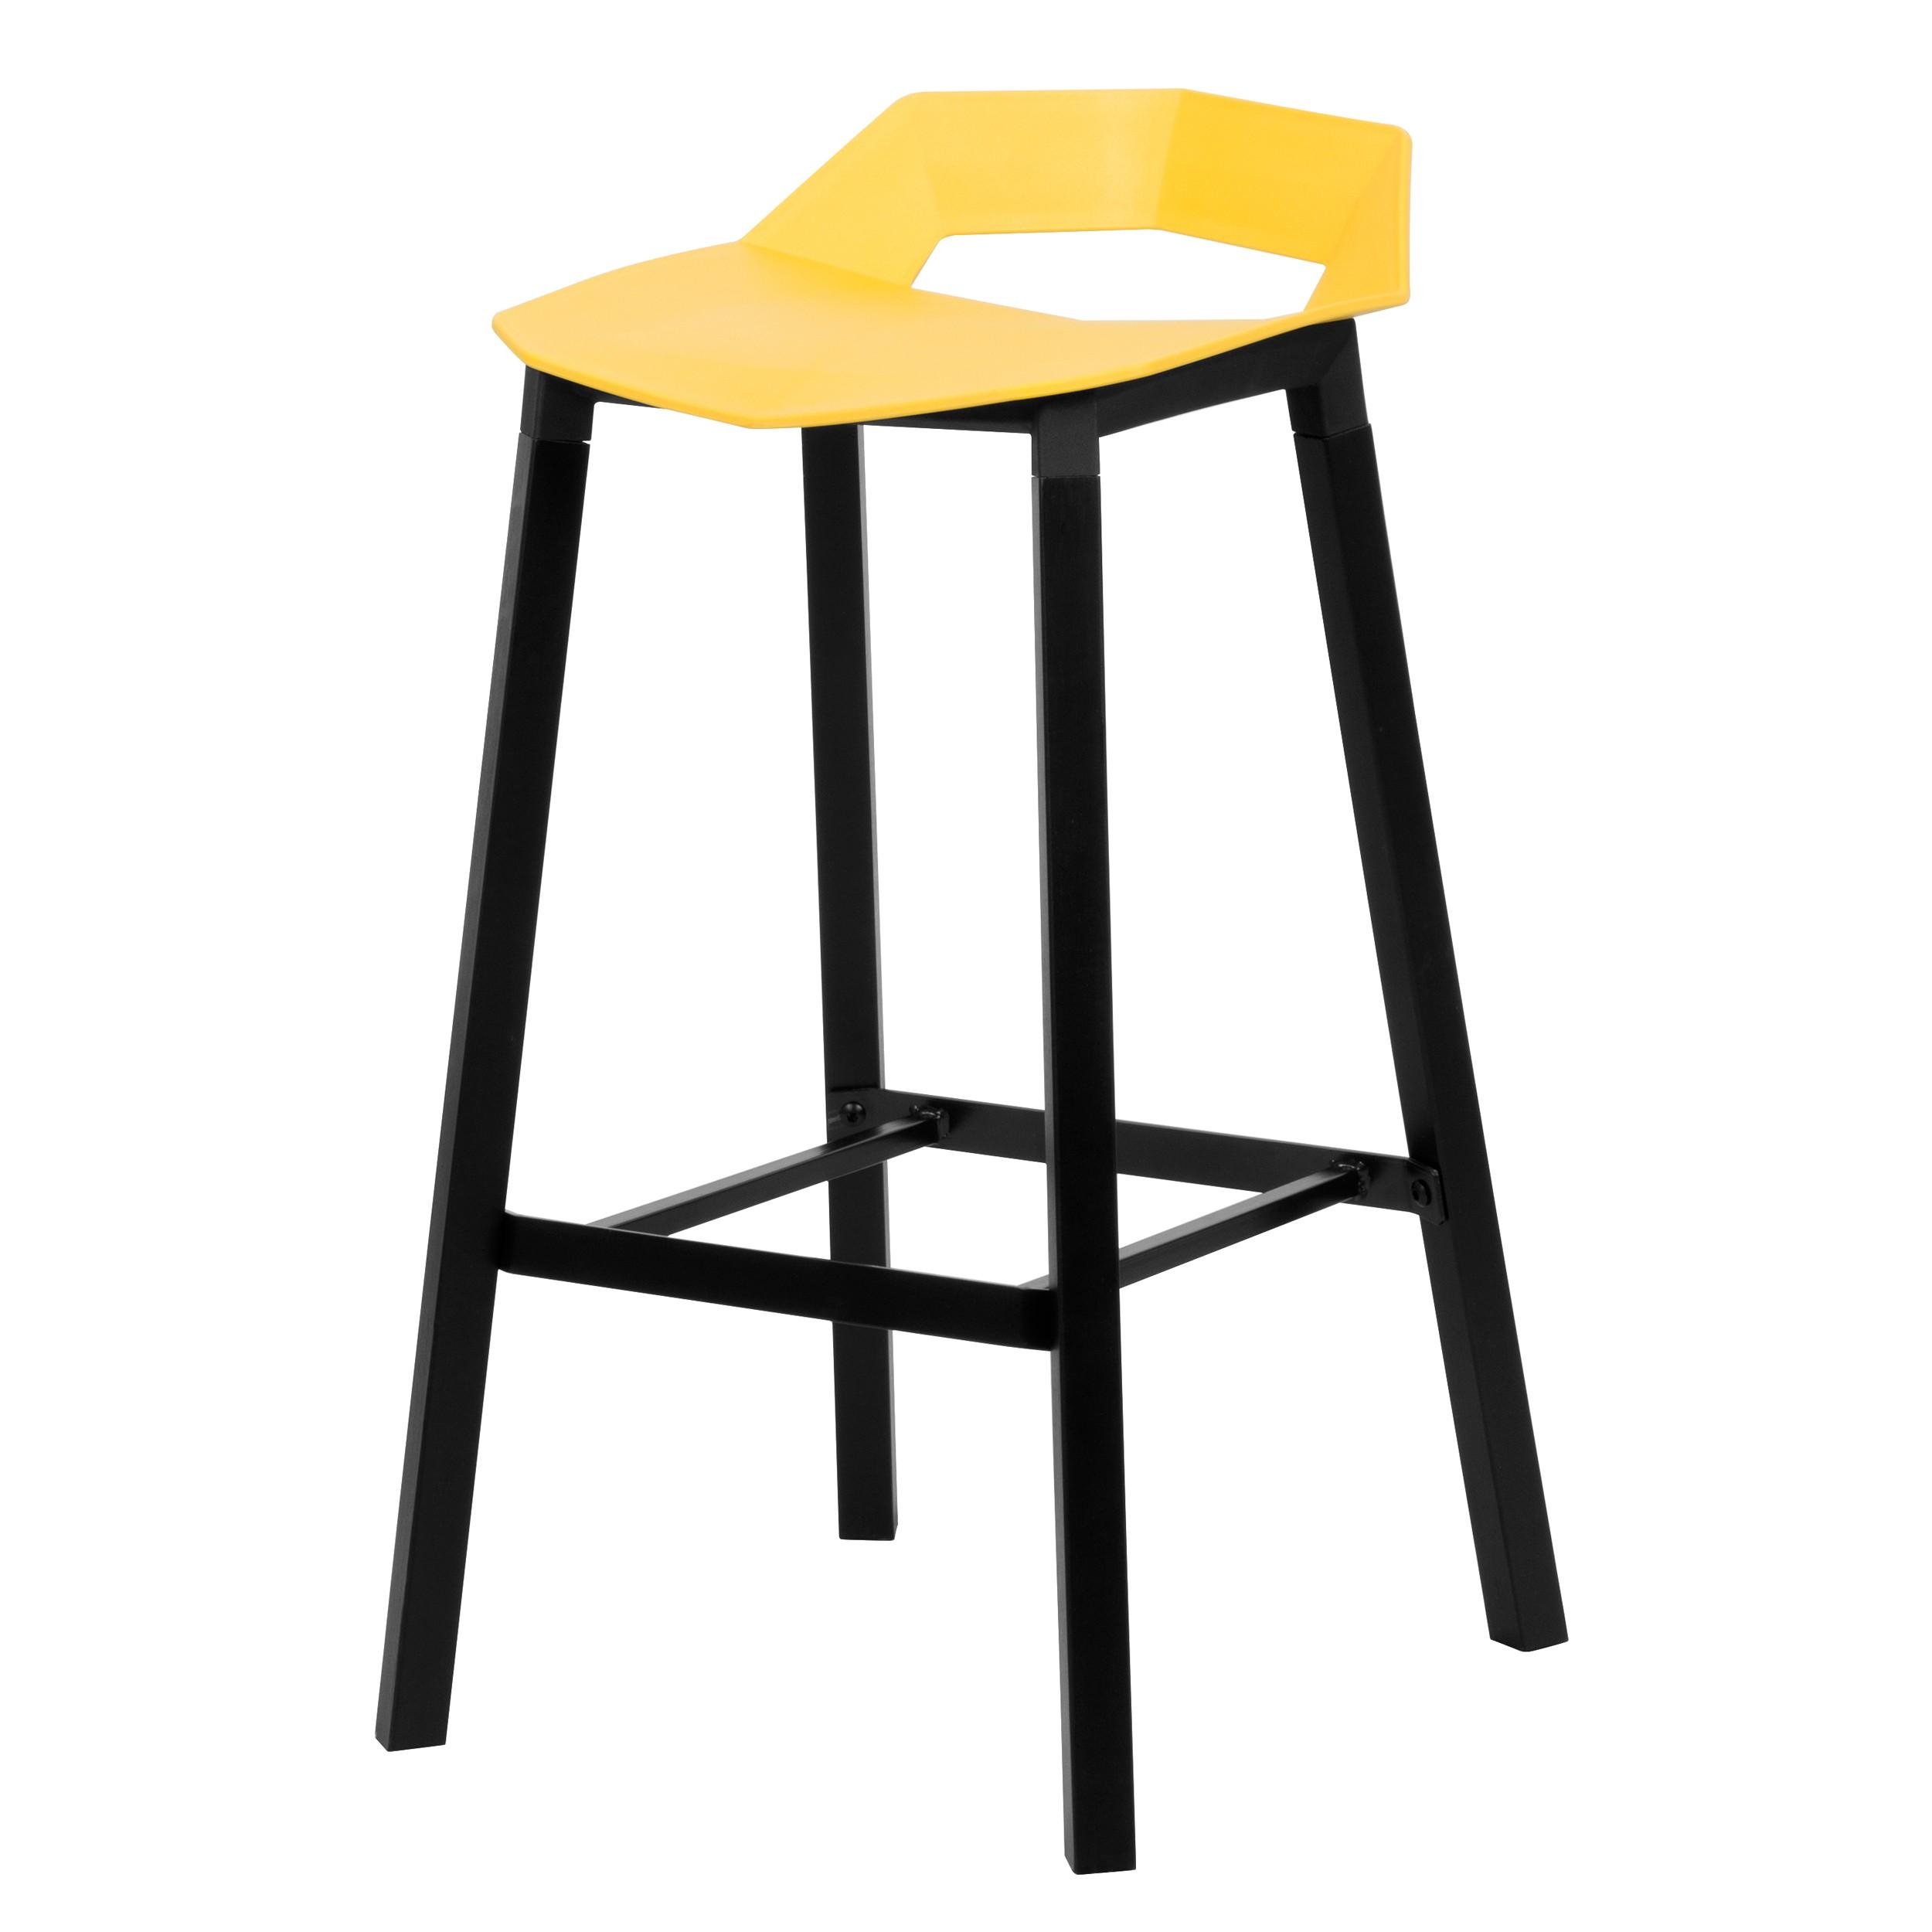 acheter tabouret de bar jaune design